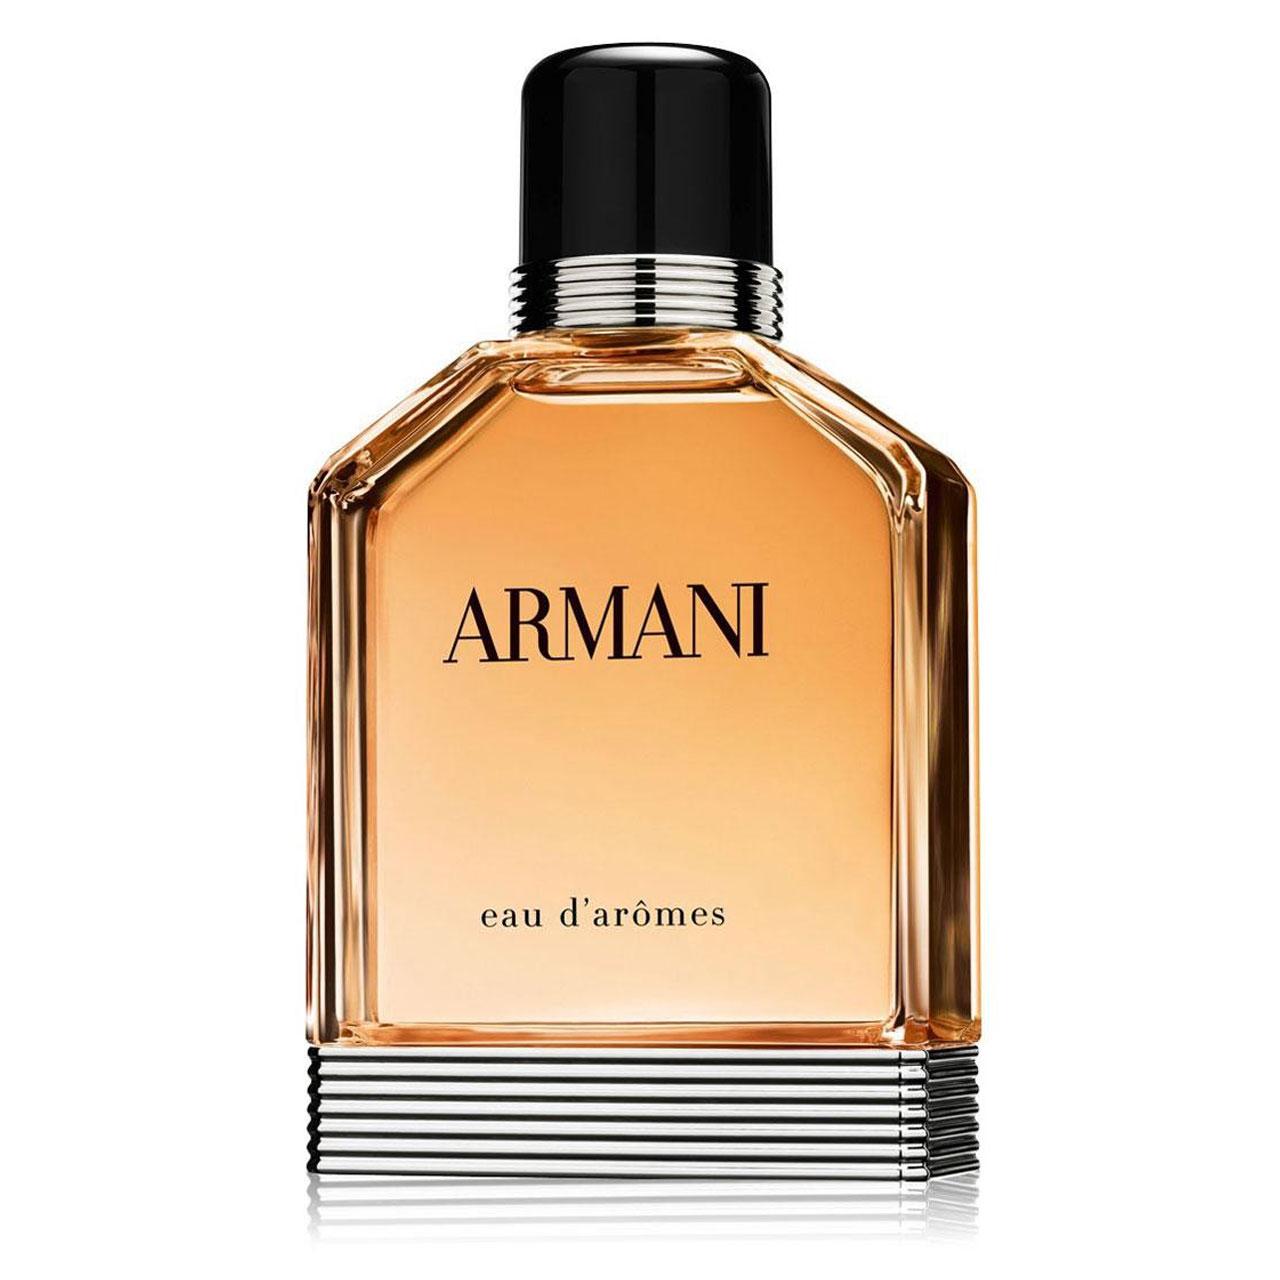 ادوتویلت مردانه جورجیو آرمانی مدل Eau d aromes حجم 50 میلی لیتر